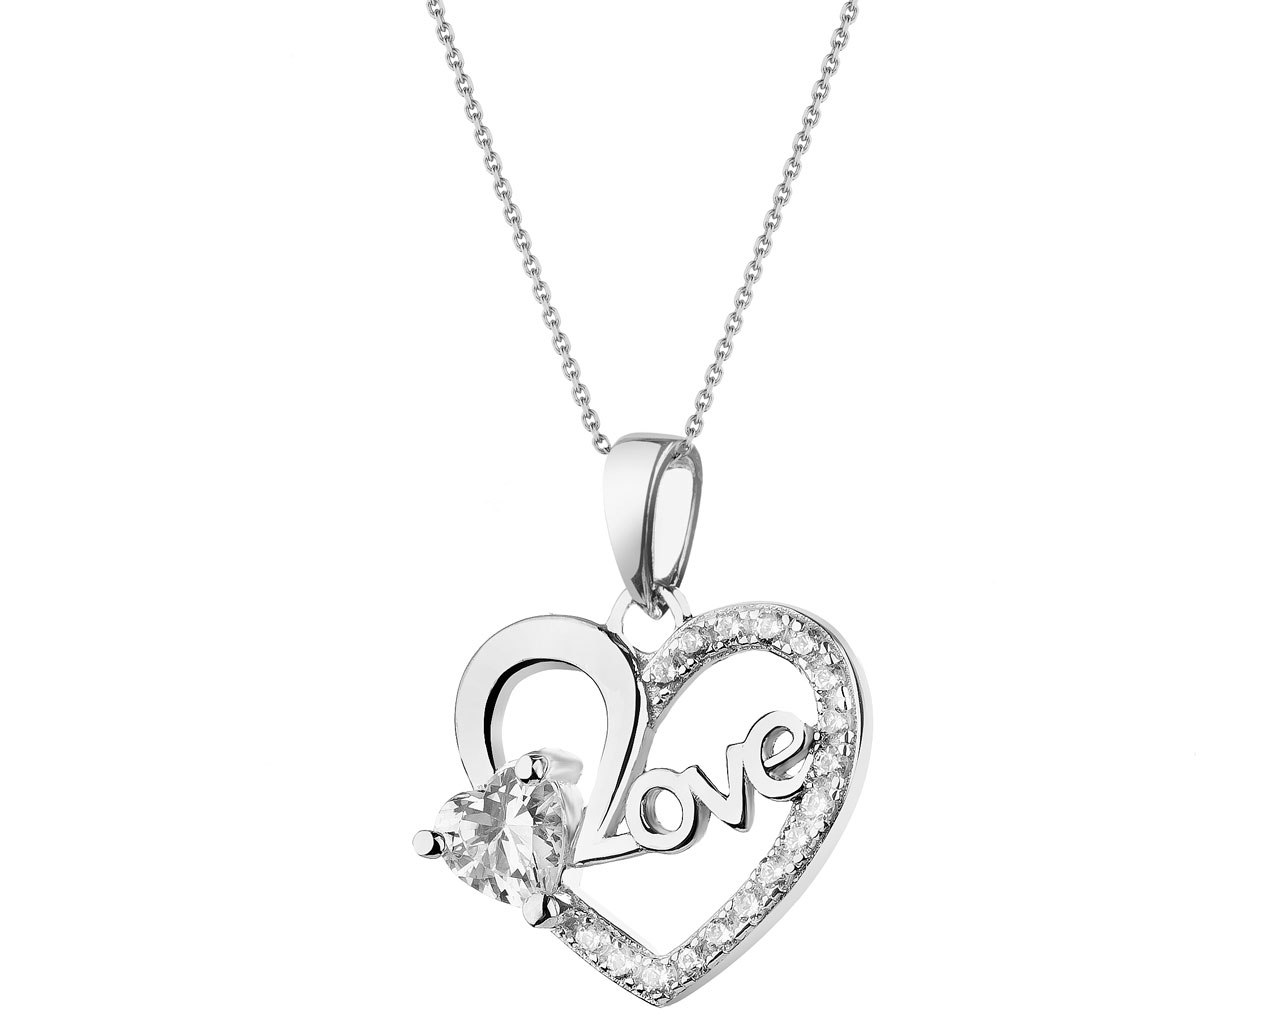 de359084a4c4ba Zawieszka srebrna z cyrkoniami - serce - wzór AP522-7869 / Apart